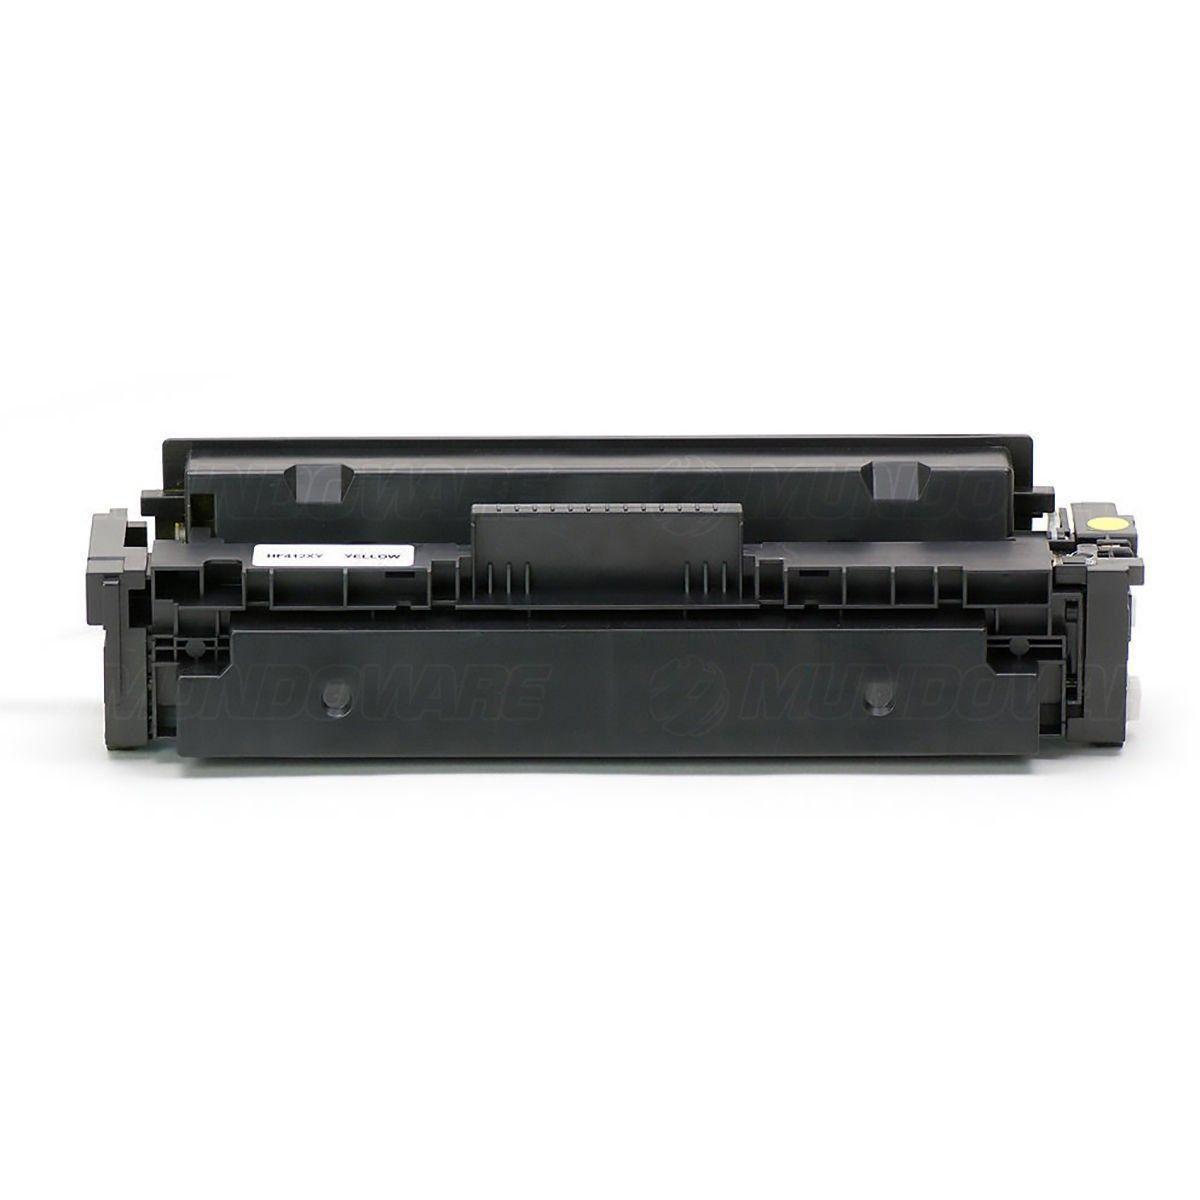 Compatível: Toner CF412X 412X para Impressora HP M477 M452 M477fdw M452dn M477fnw M452nw M-477fnw / Amarelo / 5.000